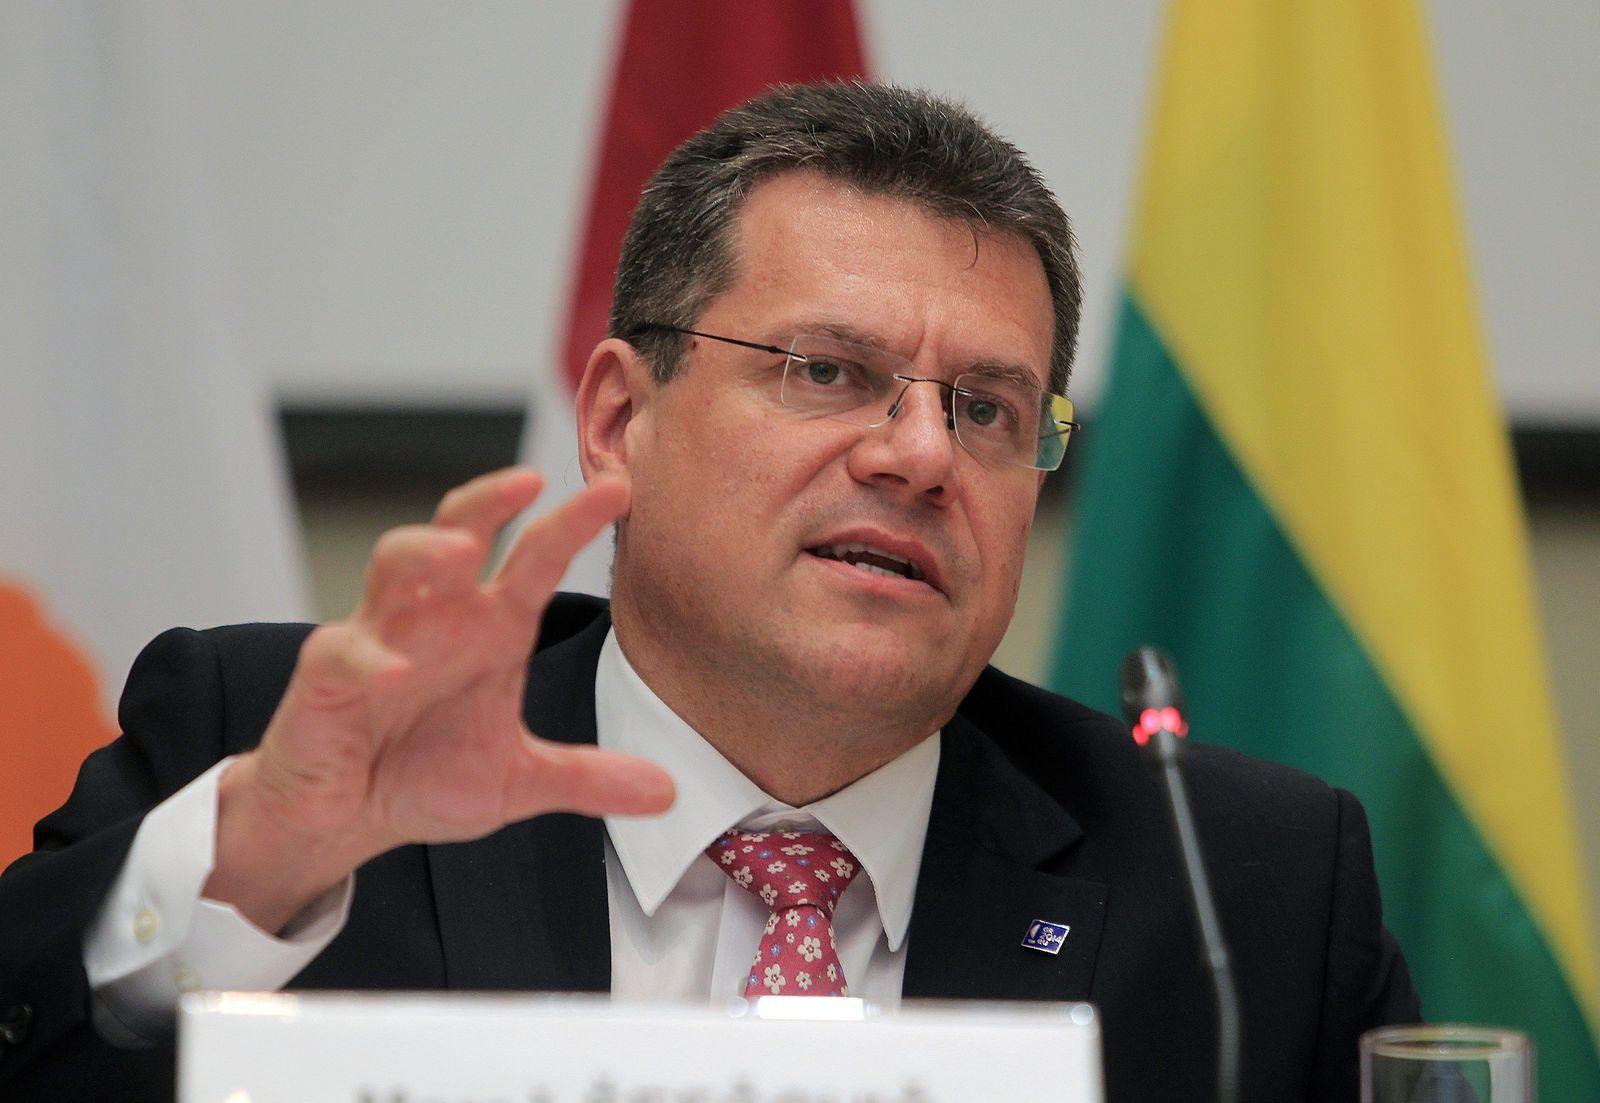 EU-Kommission 2014/ Maros Sefcovic